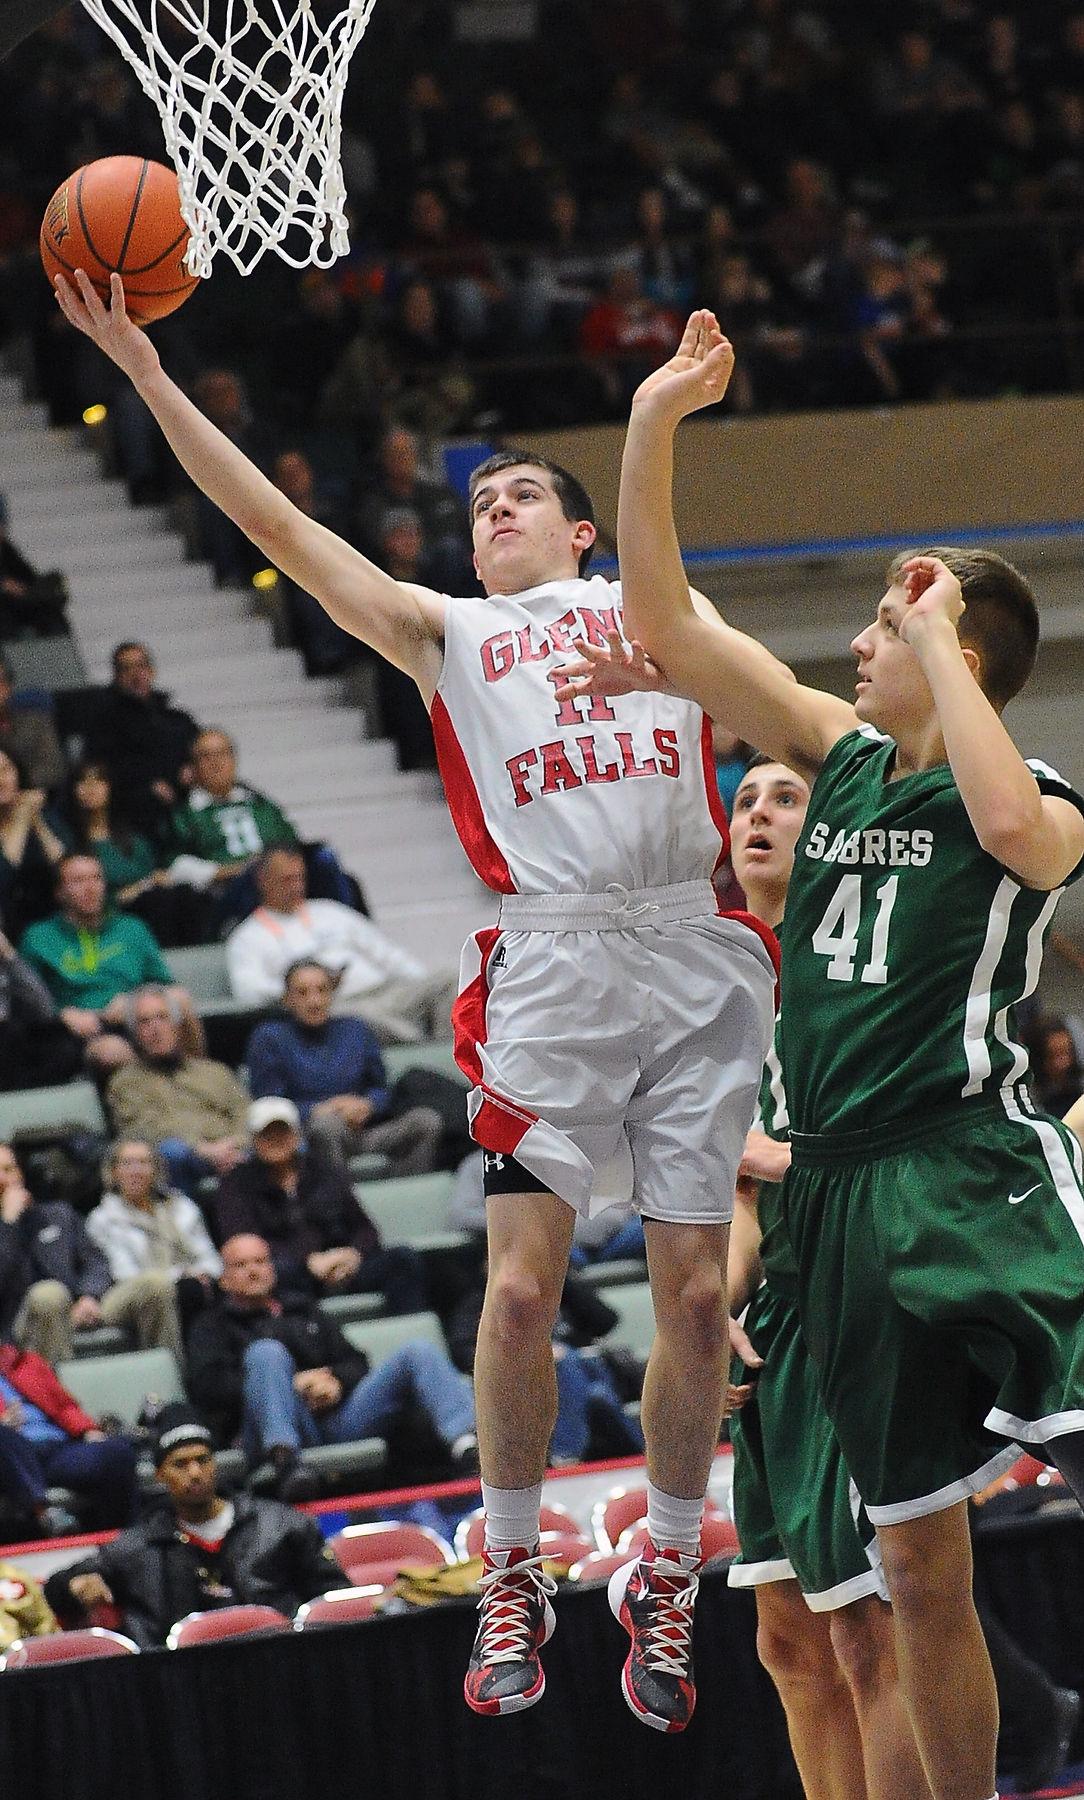 Glens Falls vs Schalmont 3